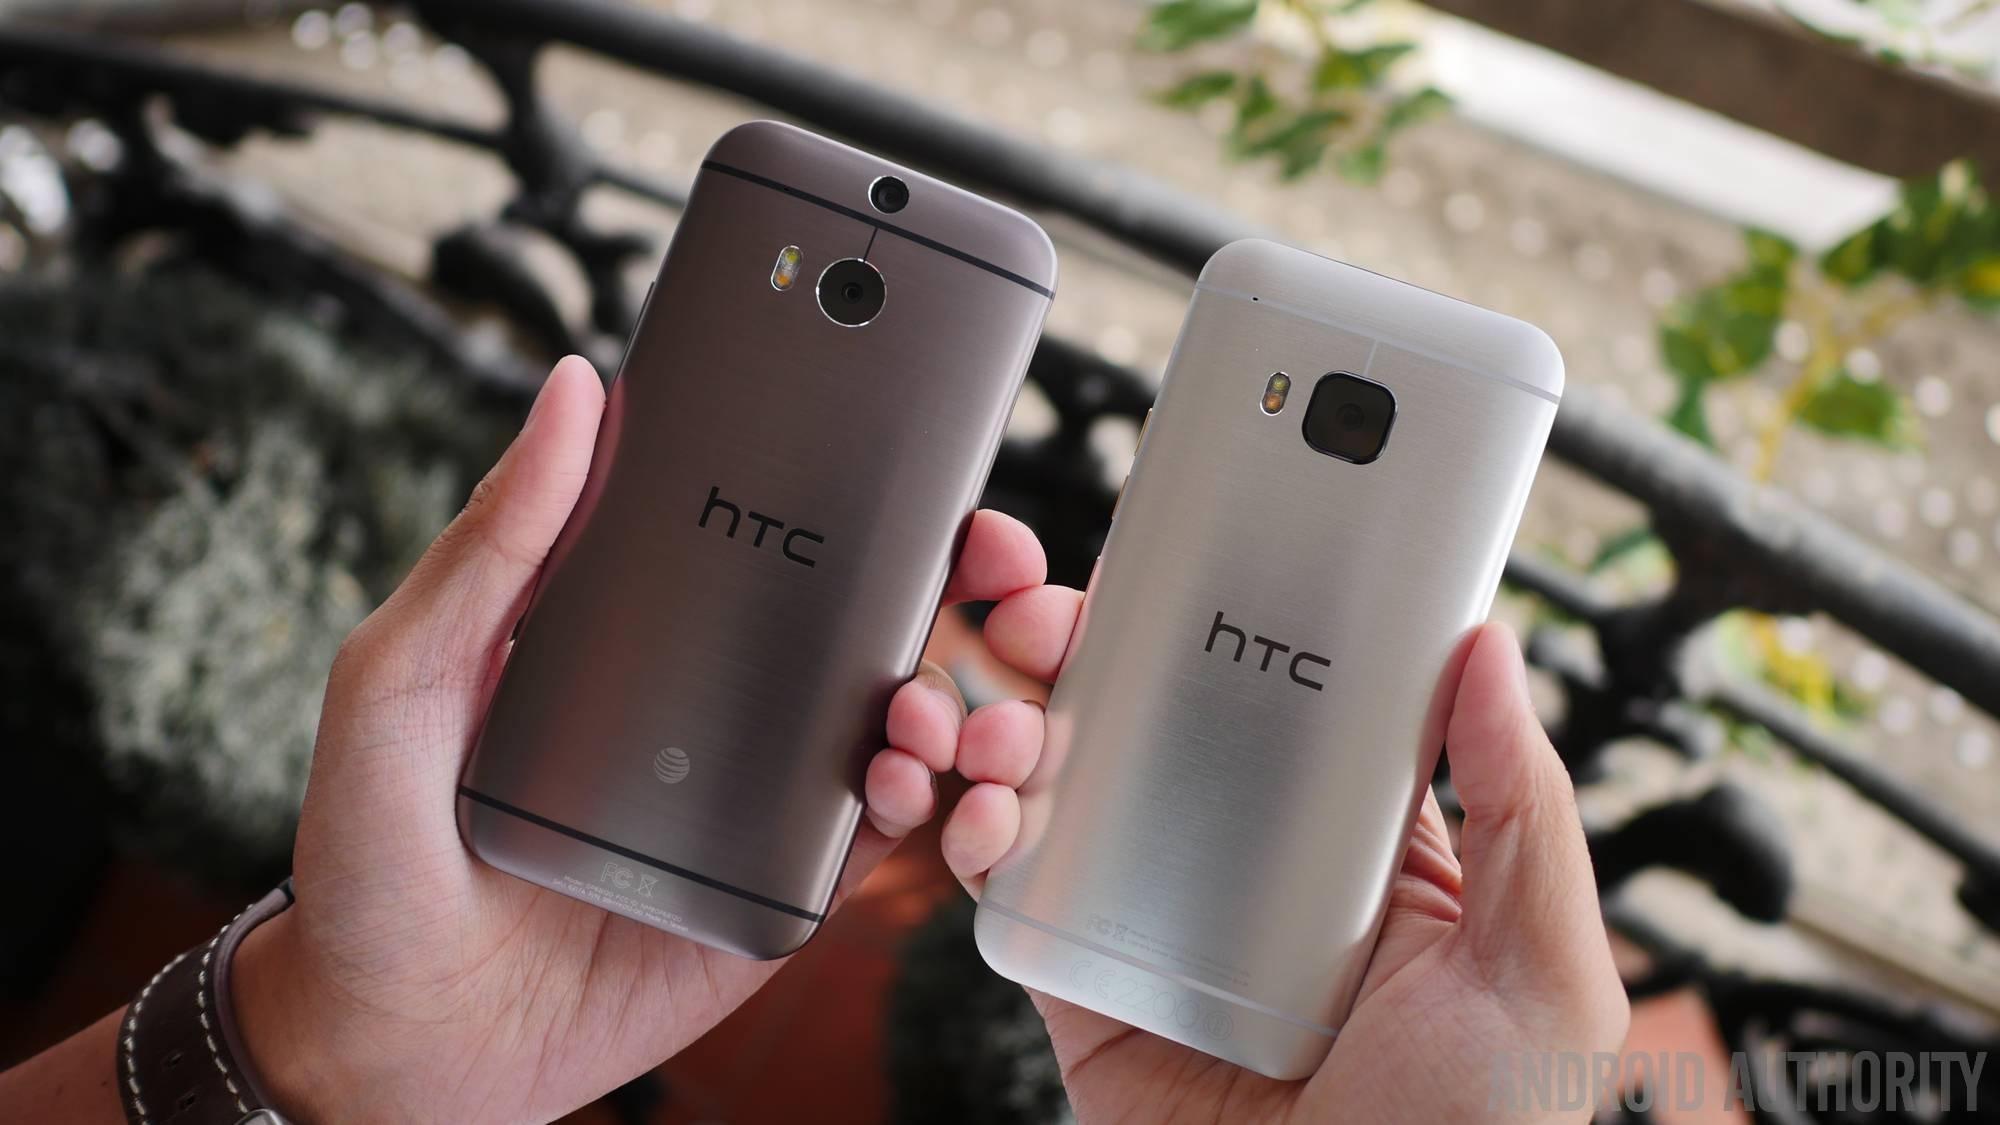 htc one m9 vs htc one m8 2